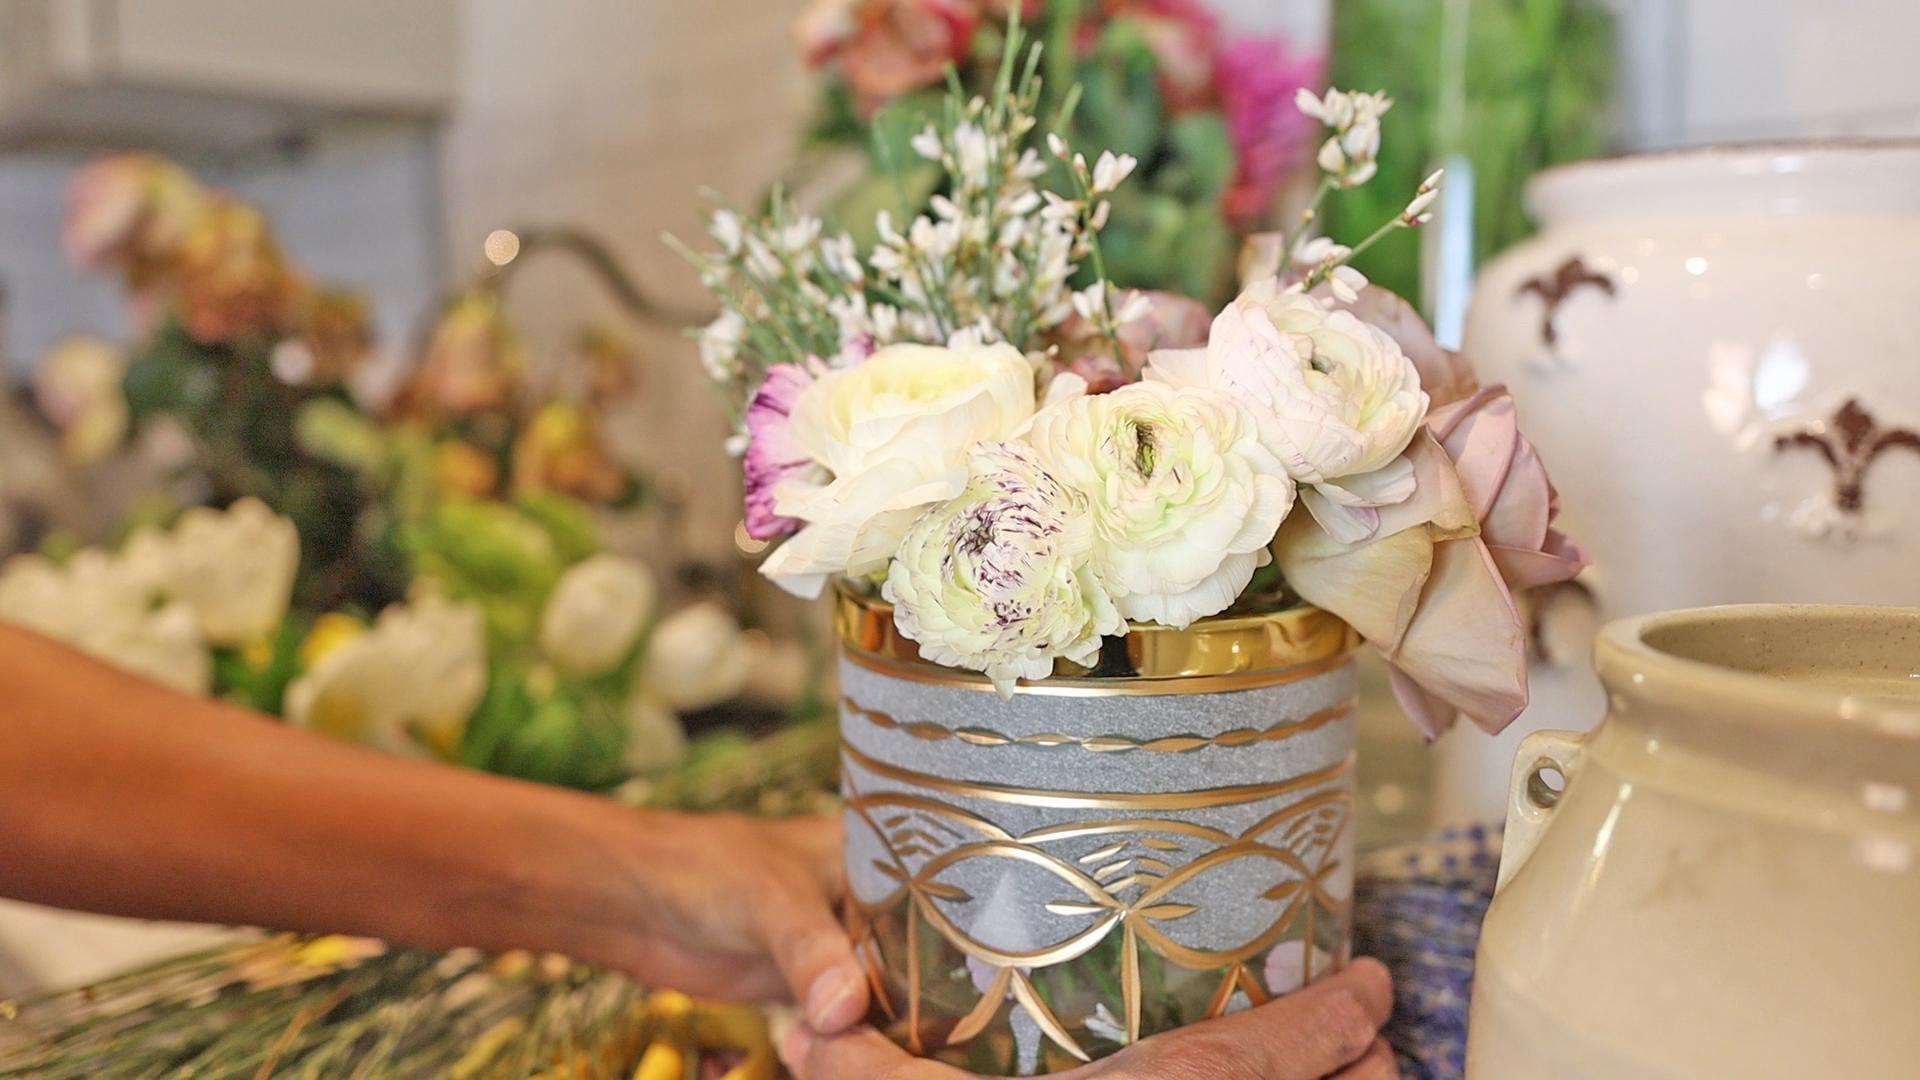 Roses, ranunculus, carnations, and genestra in the medium sized vase